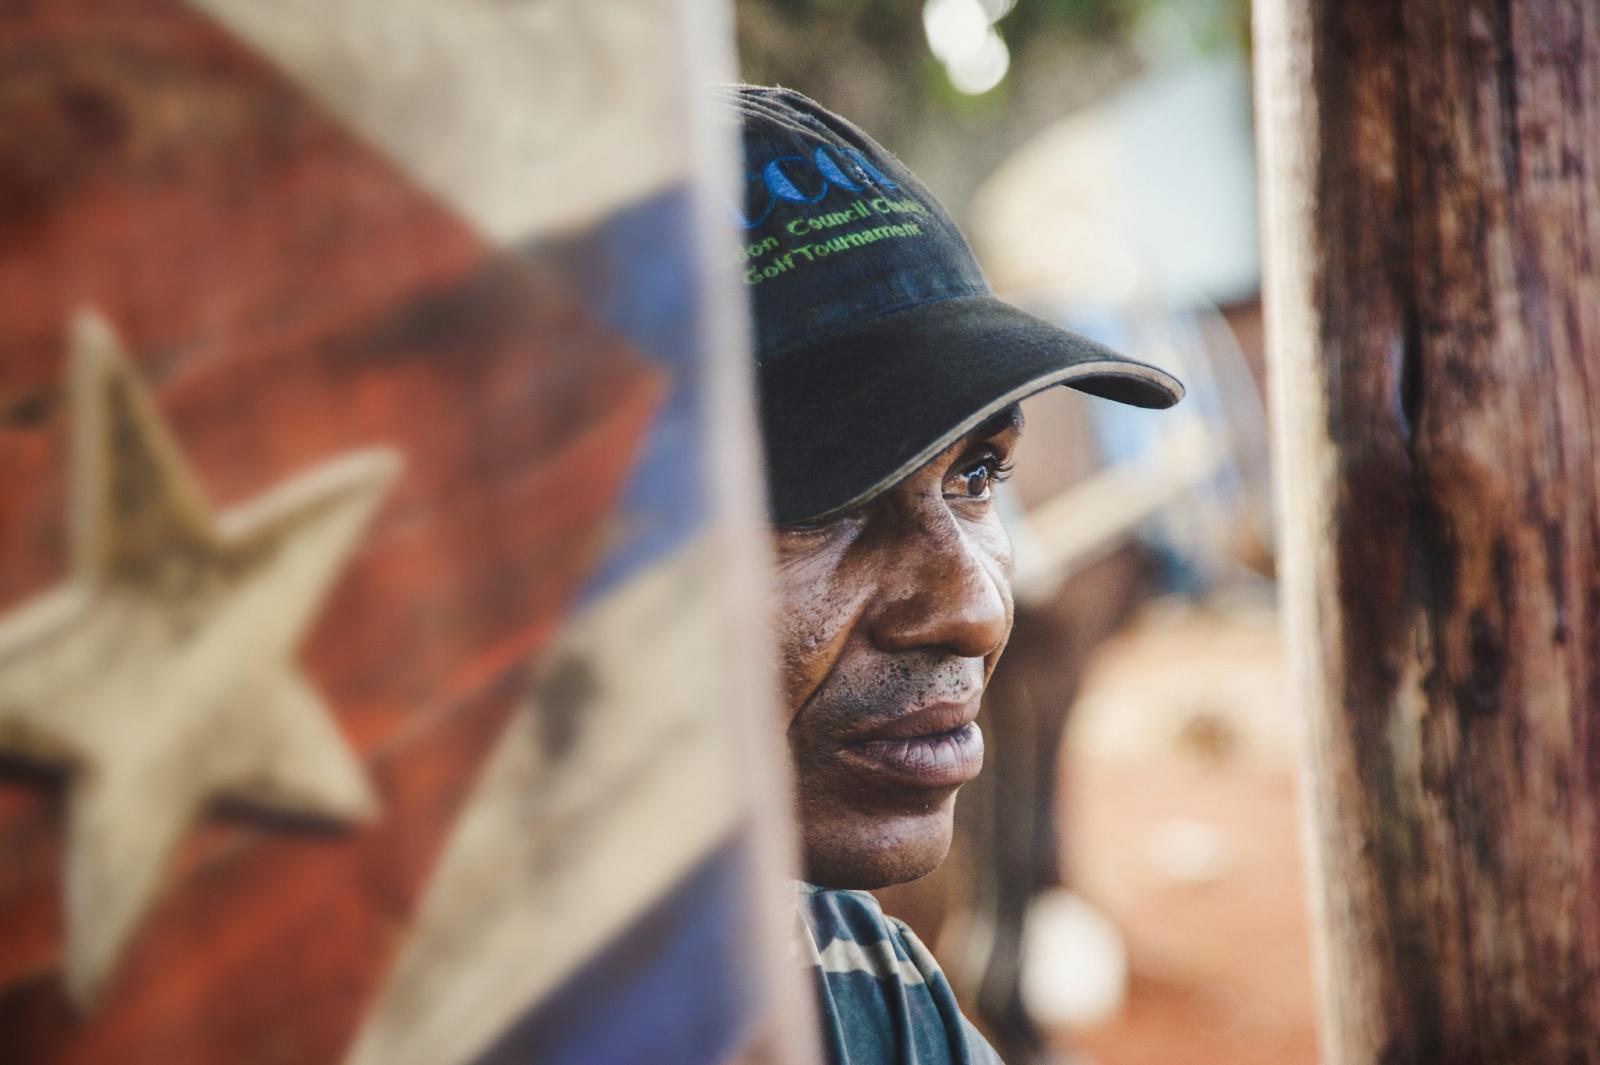 Cuban portrait in Matanzas